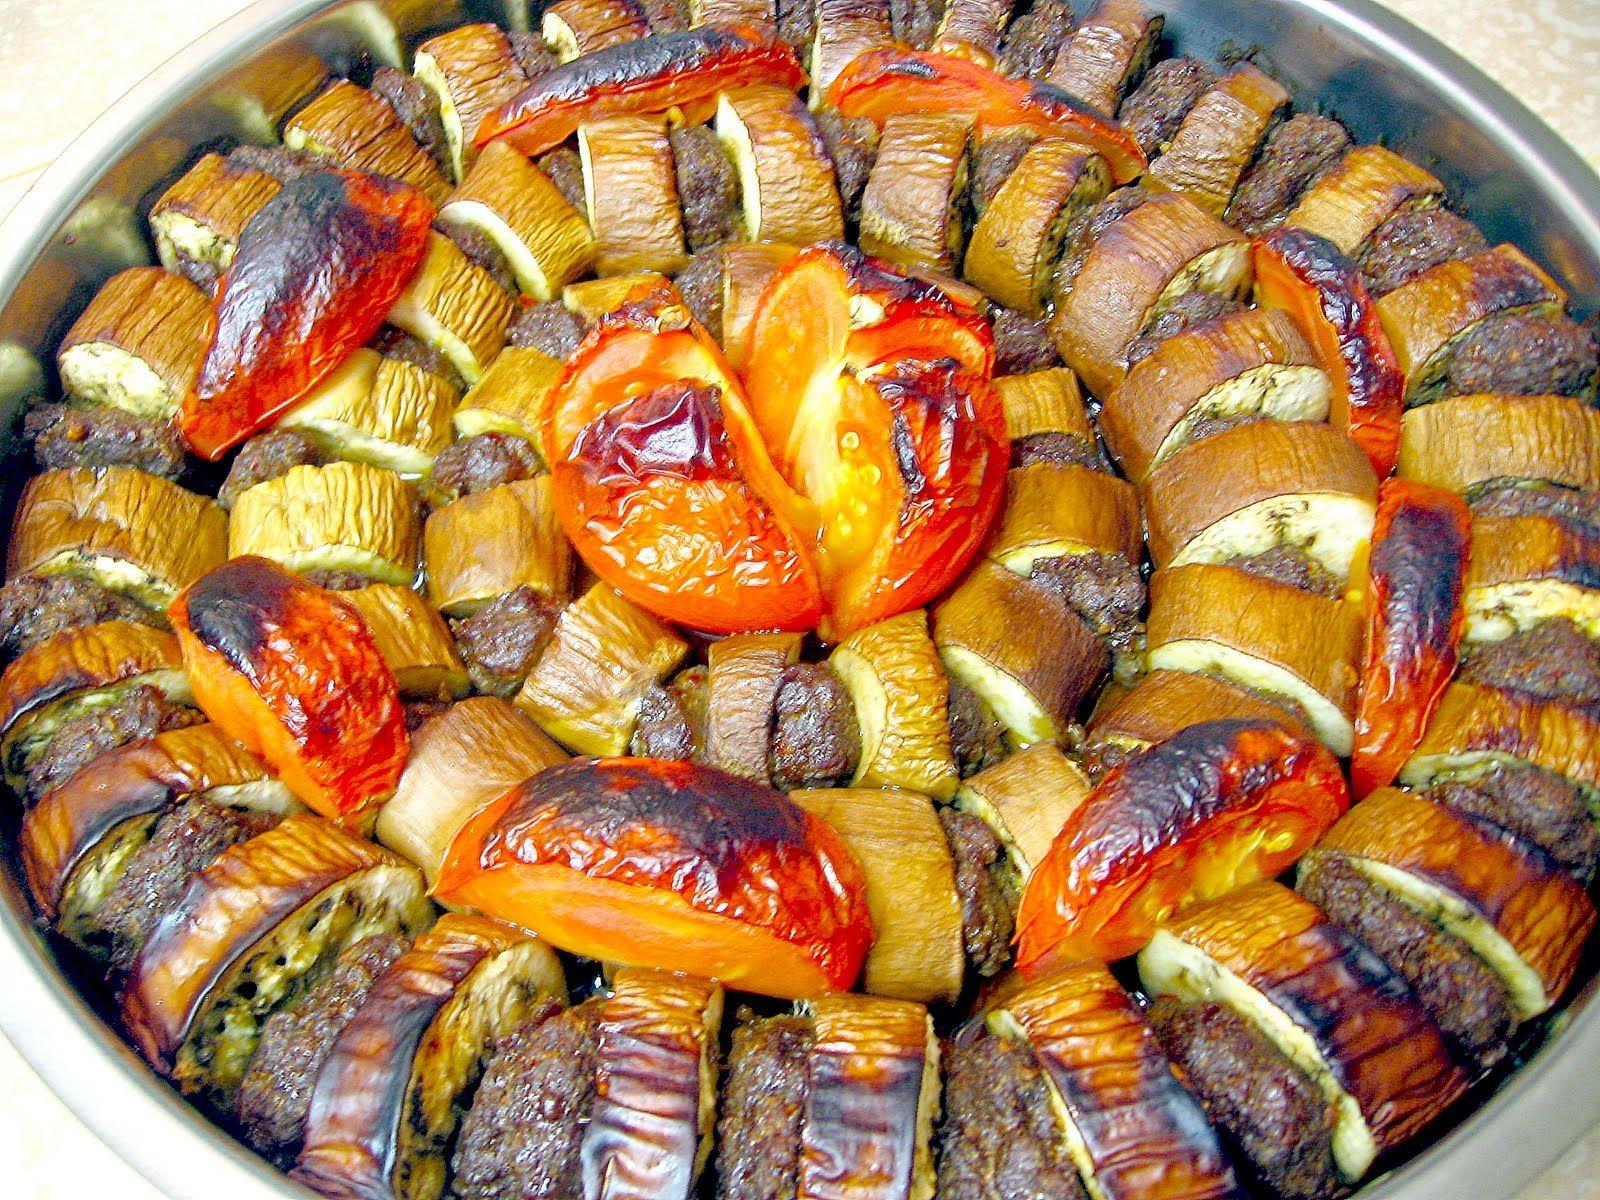 Patlican kebab eggplant kebab a traditional turkish dish yum patlican kebab eggplant kebab a traditional turkish dish yum turkish food recipesturkish forumfinder Image collections